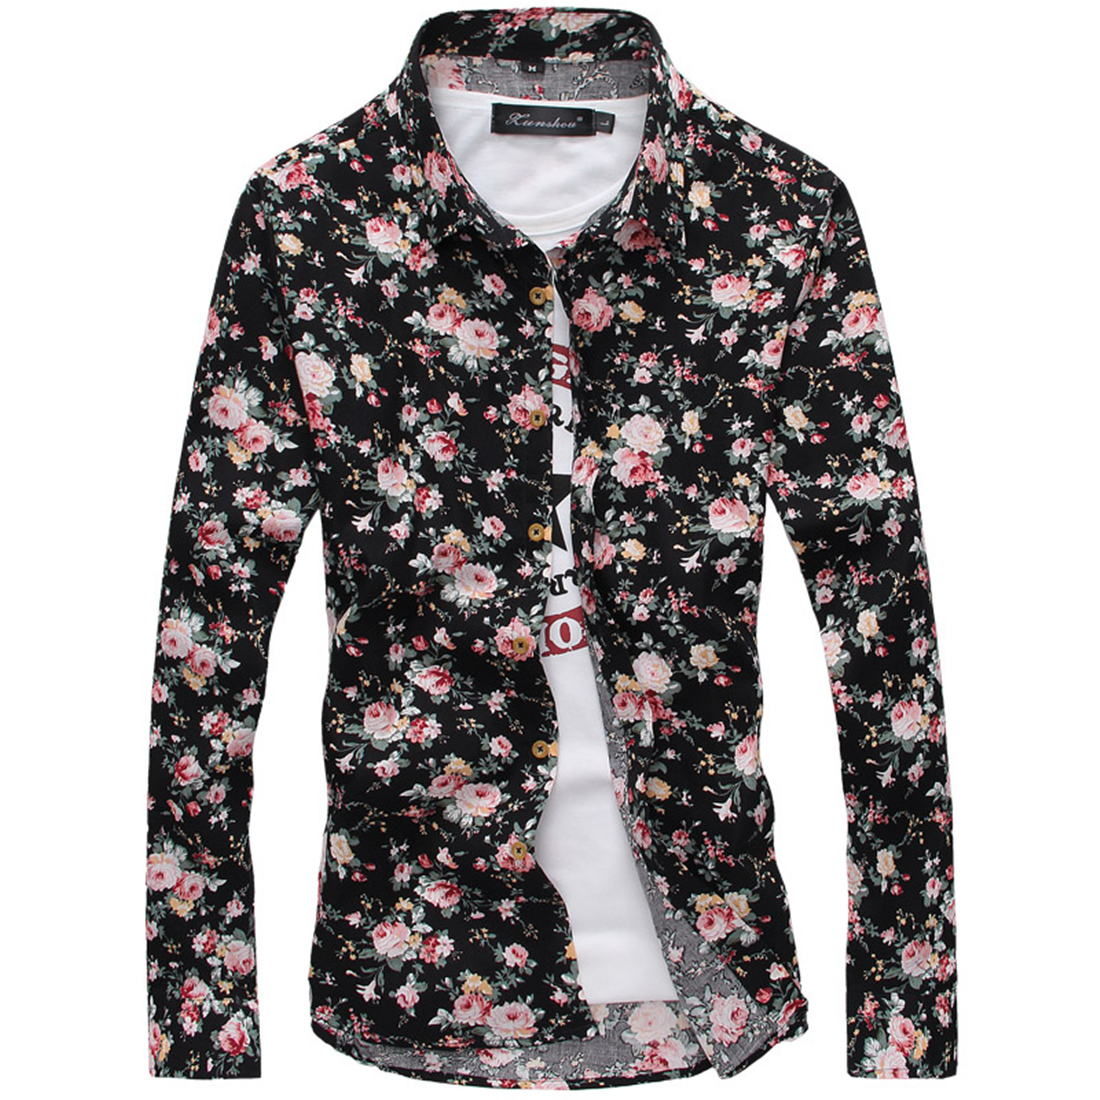 Shirt design gents - 3xl Turn Down Collar Casual Slim Shirts Mens Long Sleeve Floral Printed Wedding Party Shirt